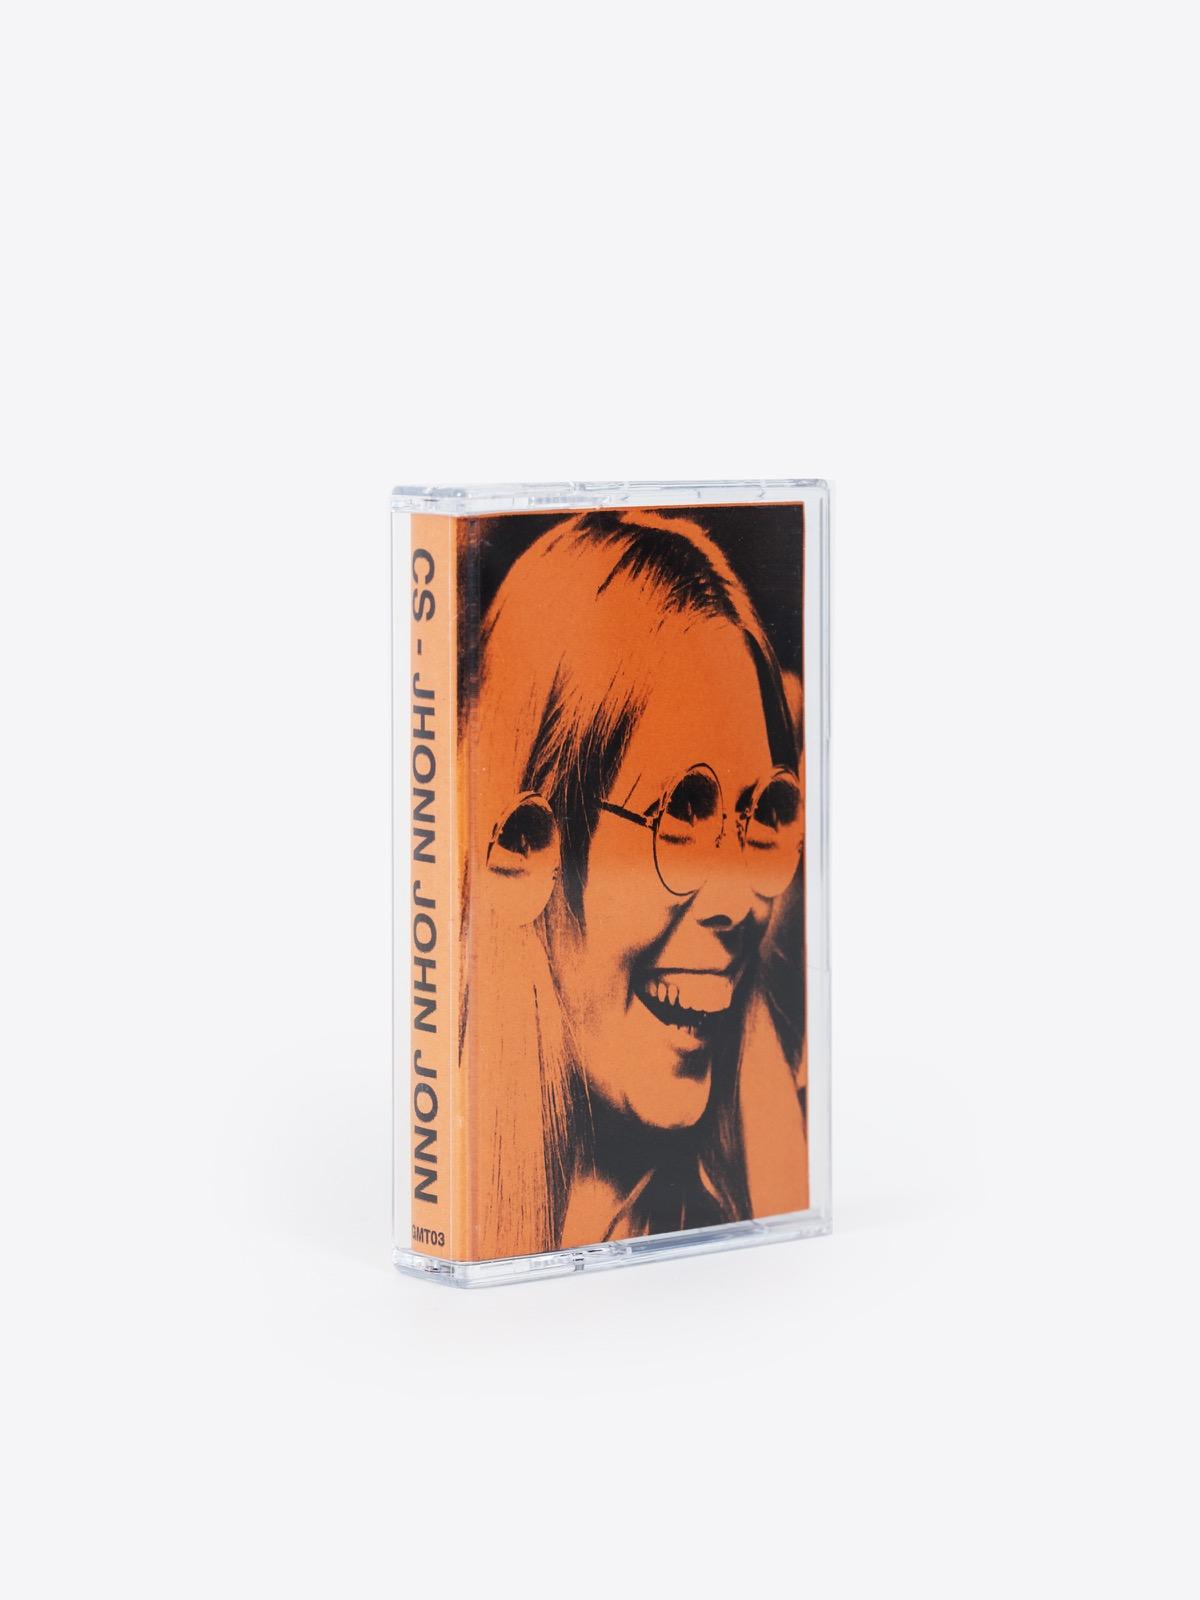 good morning tapes CS* - Jhonn John Jonn